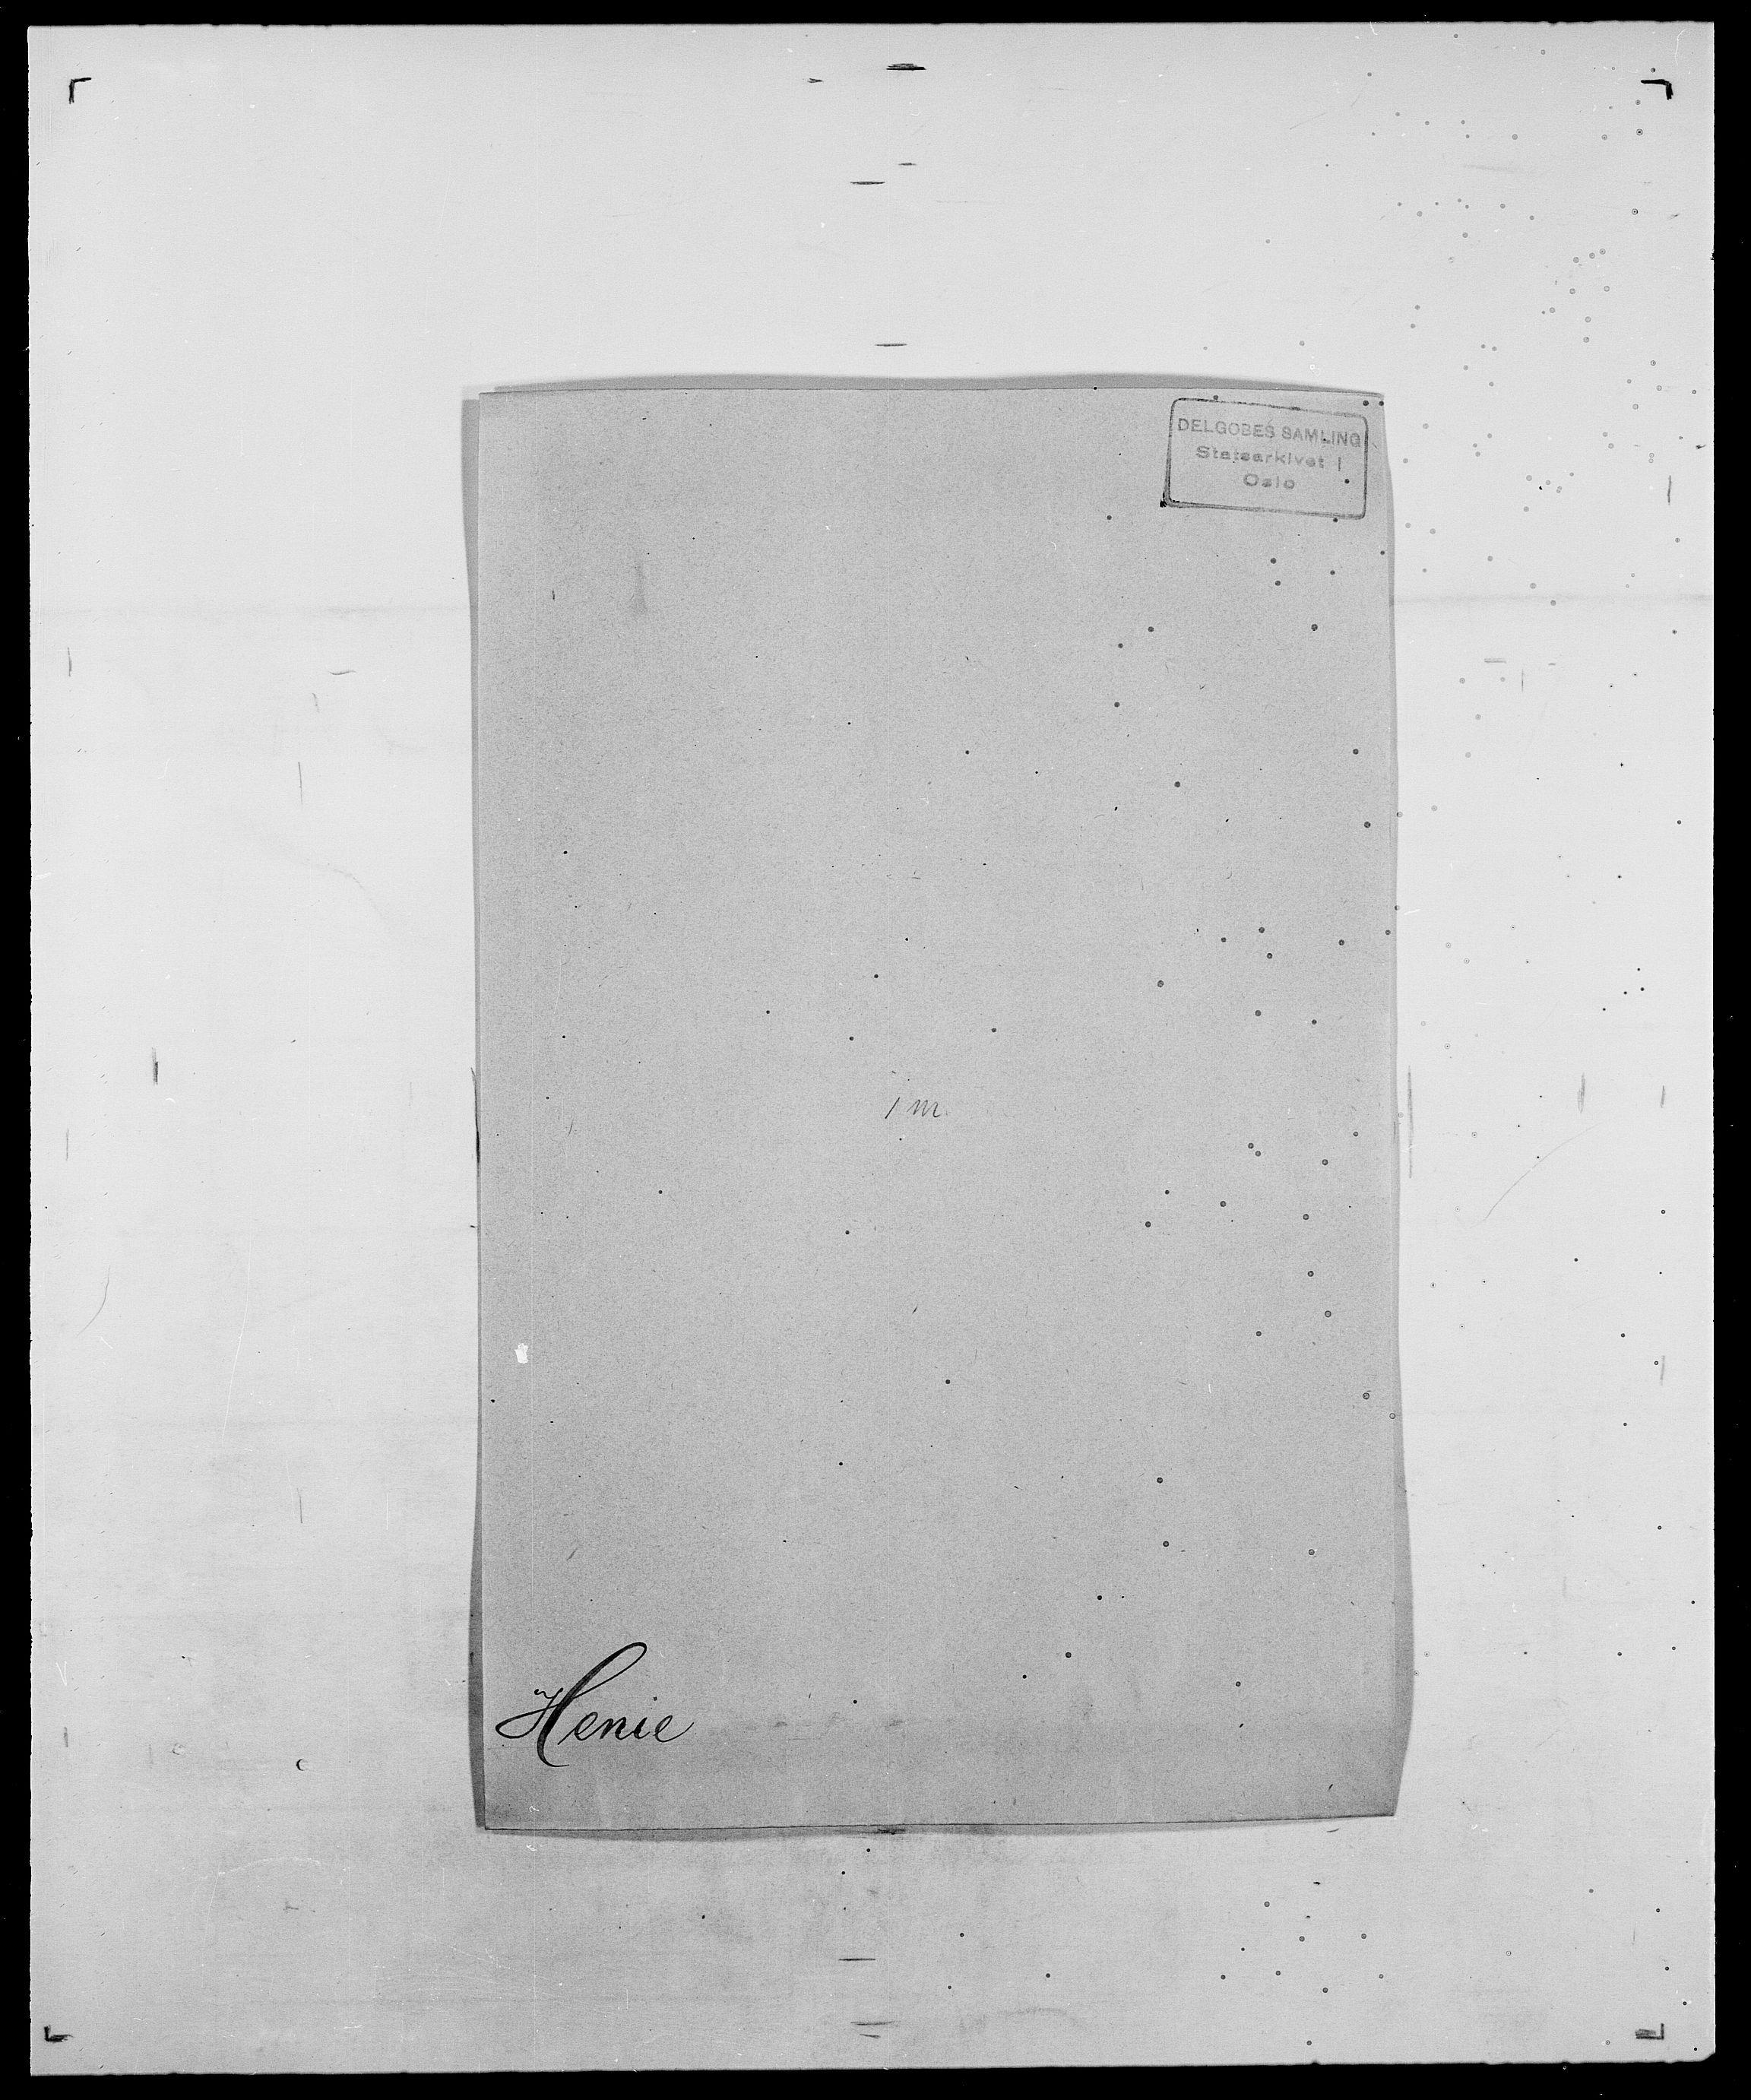 SAO, Delgobe, Charles Antoine - samling, D/Da/L0017: Helander - Hjørne, s. 176